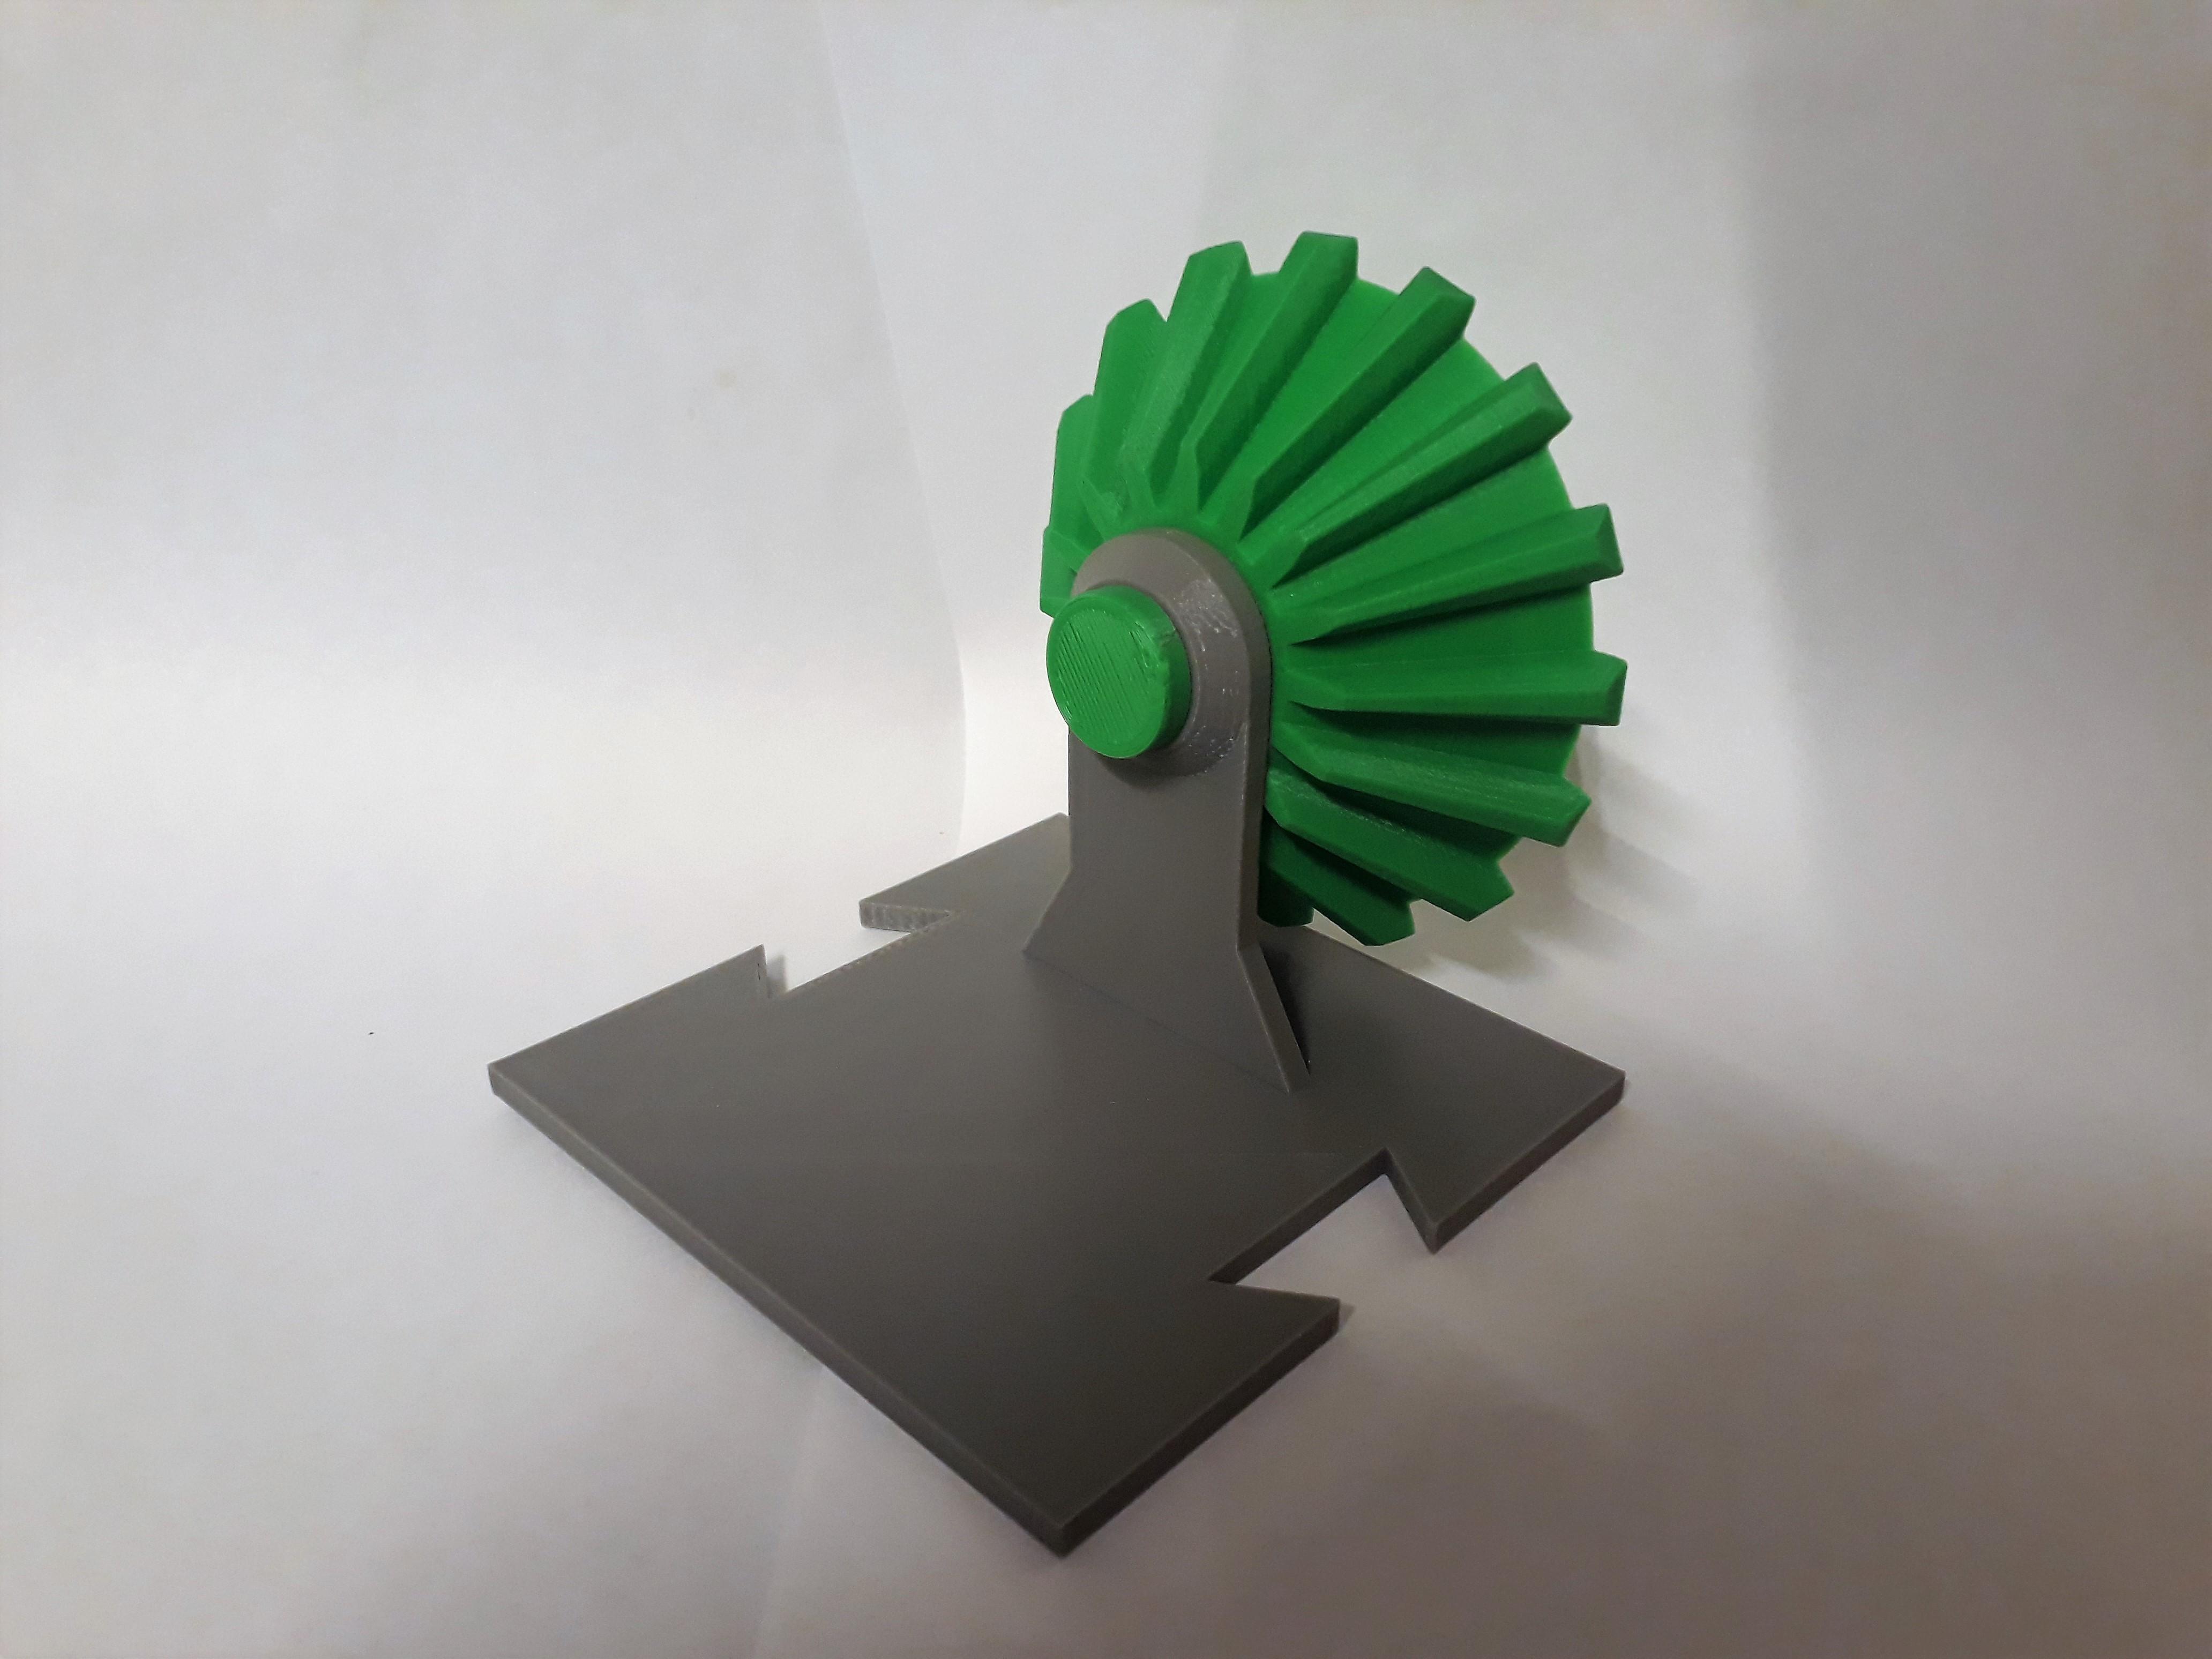 Clockwise Mechanism Connecting 6.jpg Download STL file Clockwise Mechanism • 3D printer model, Chrisibub